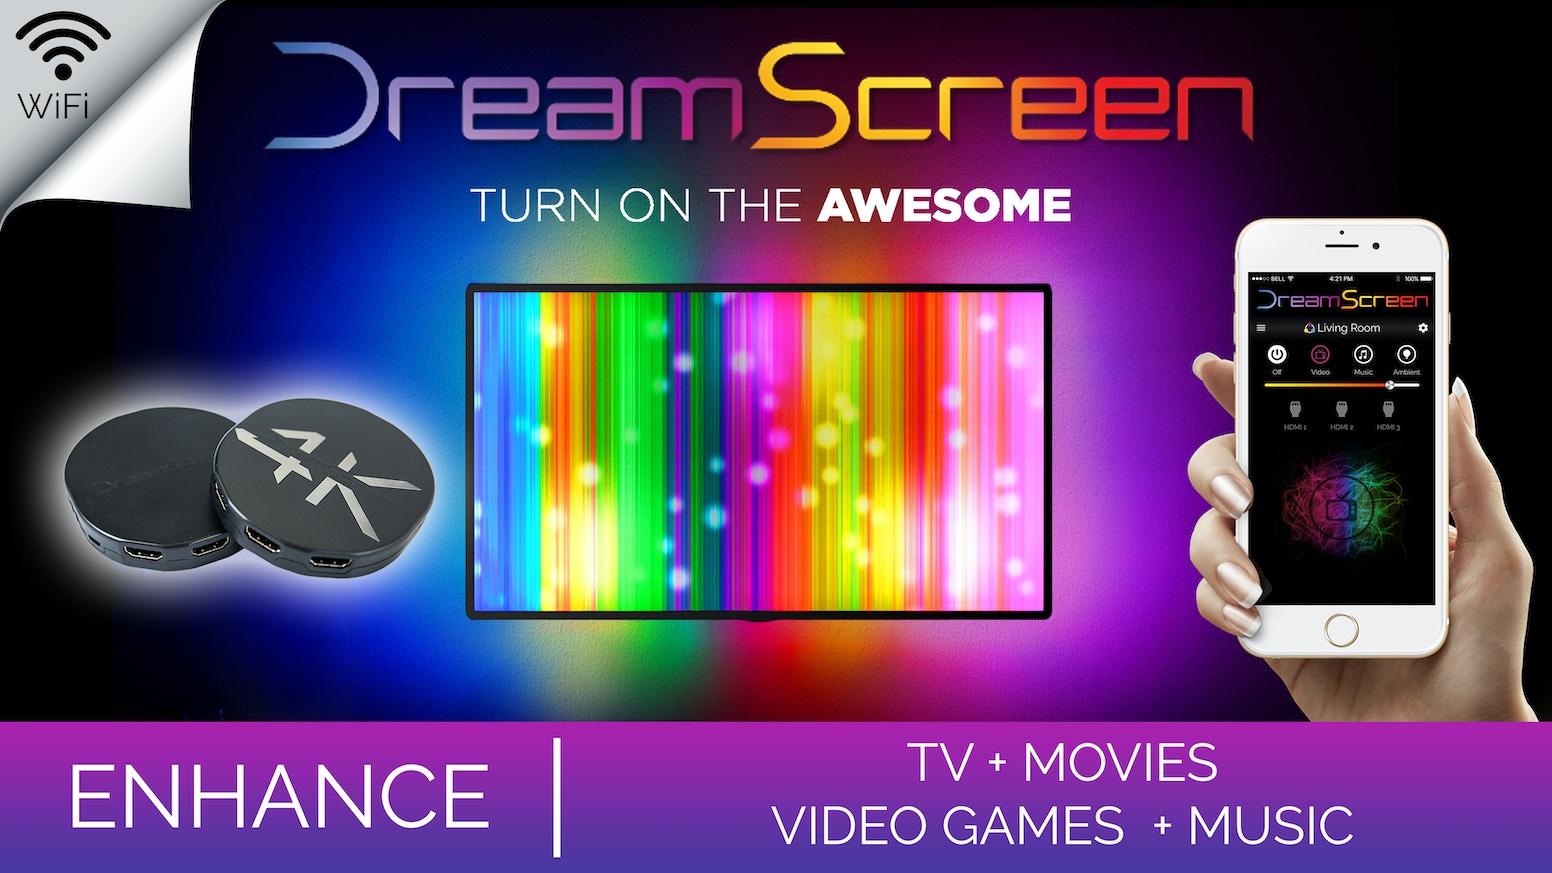 Dreamscreen Hd Amp 4k Smart Tv Backlighting For Any Hdmi